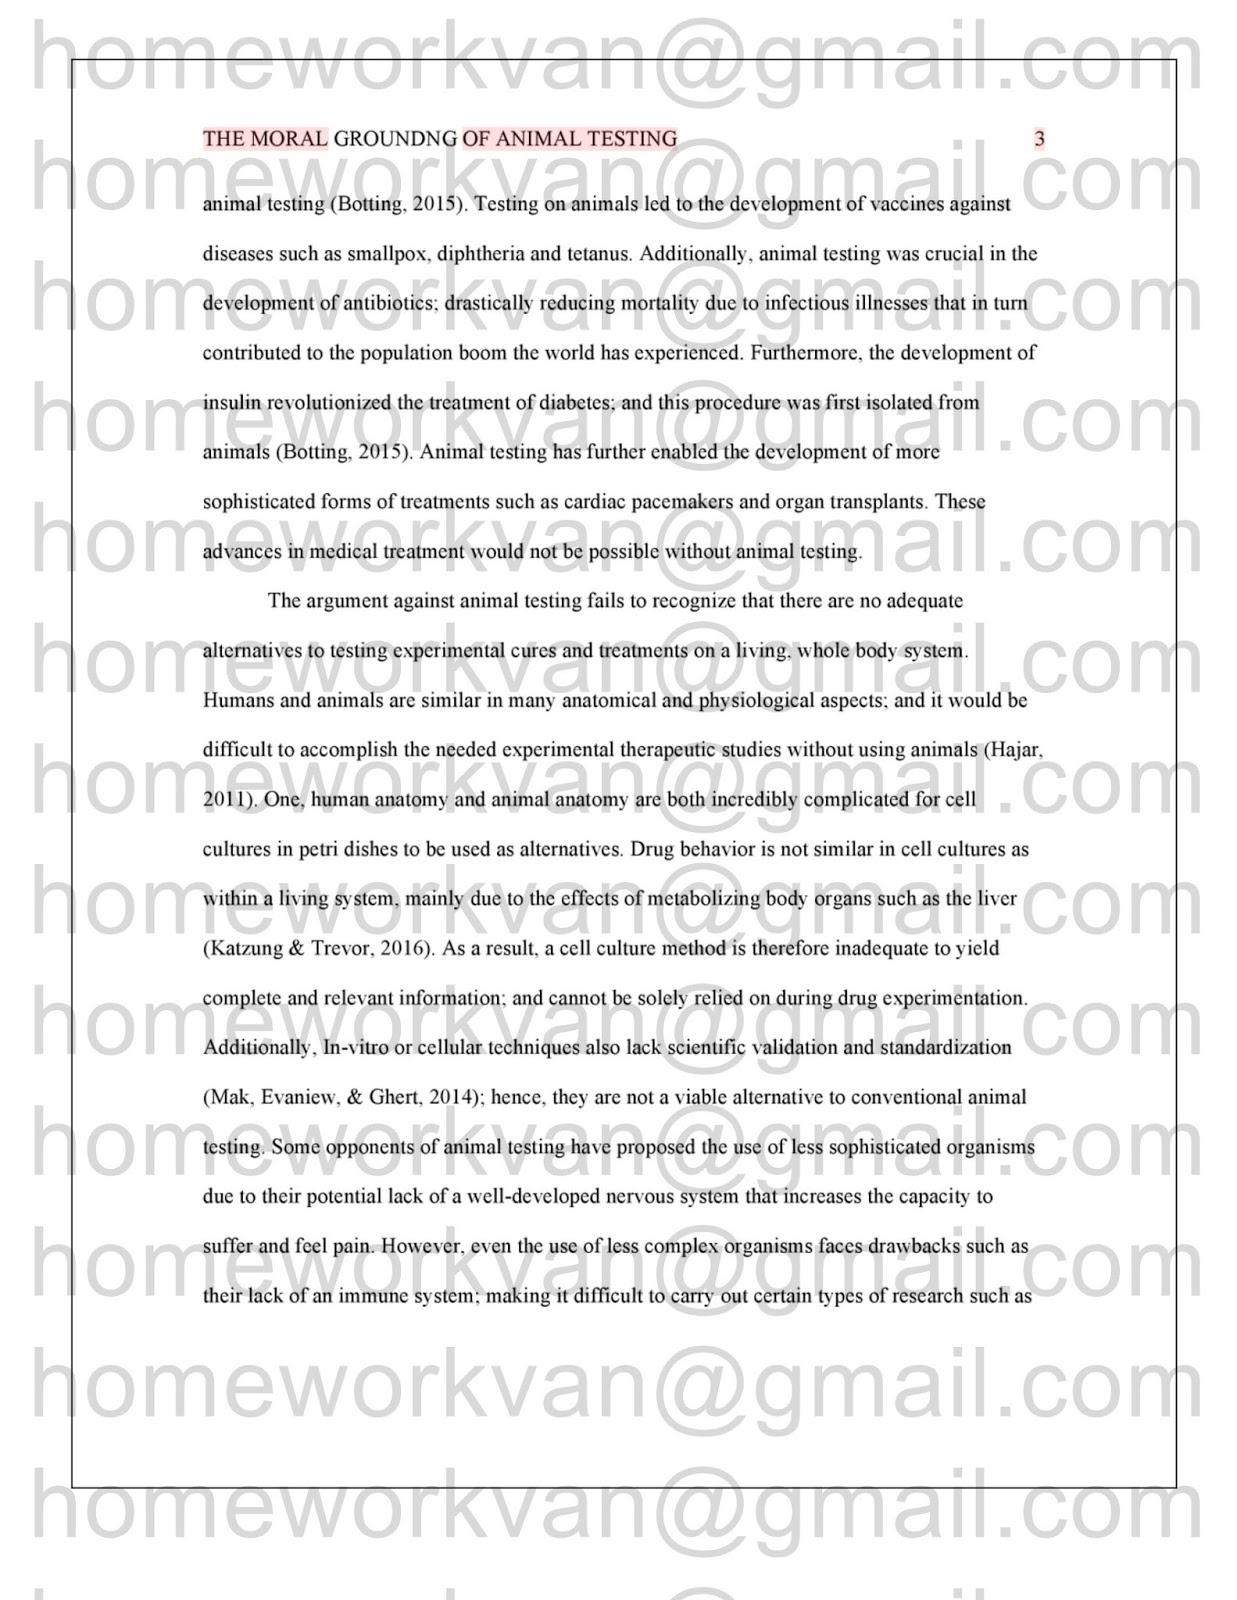 010 Animal Testing Essay Homeworkvan2bessay Surprising Pro Persuasive Conclusion Titles Full